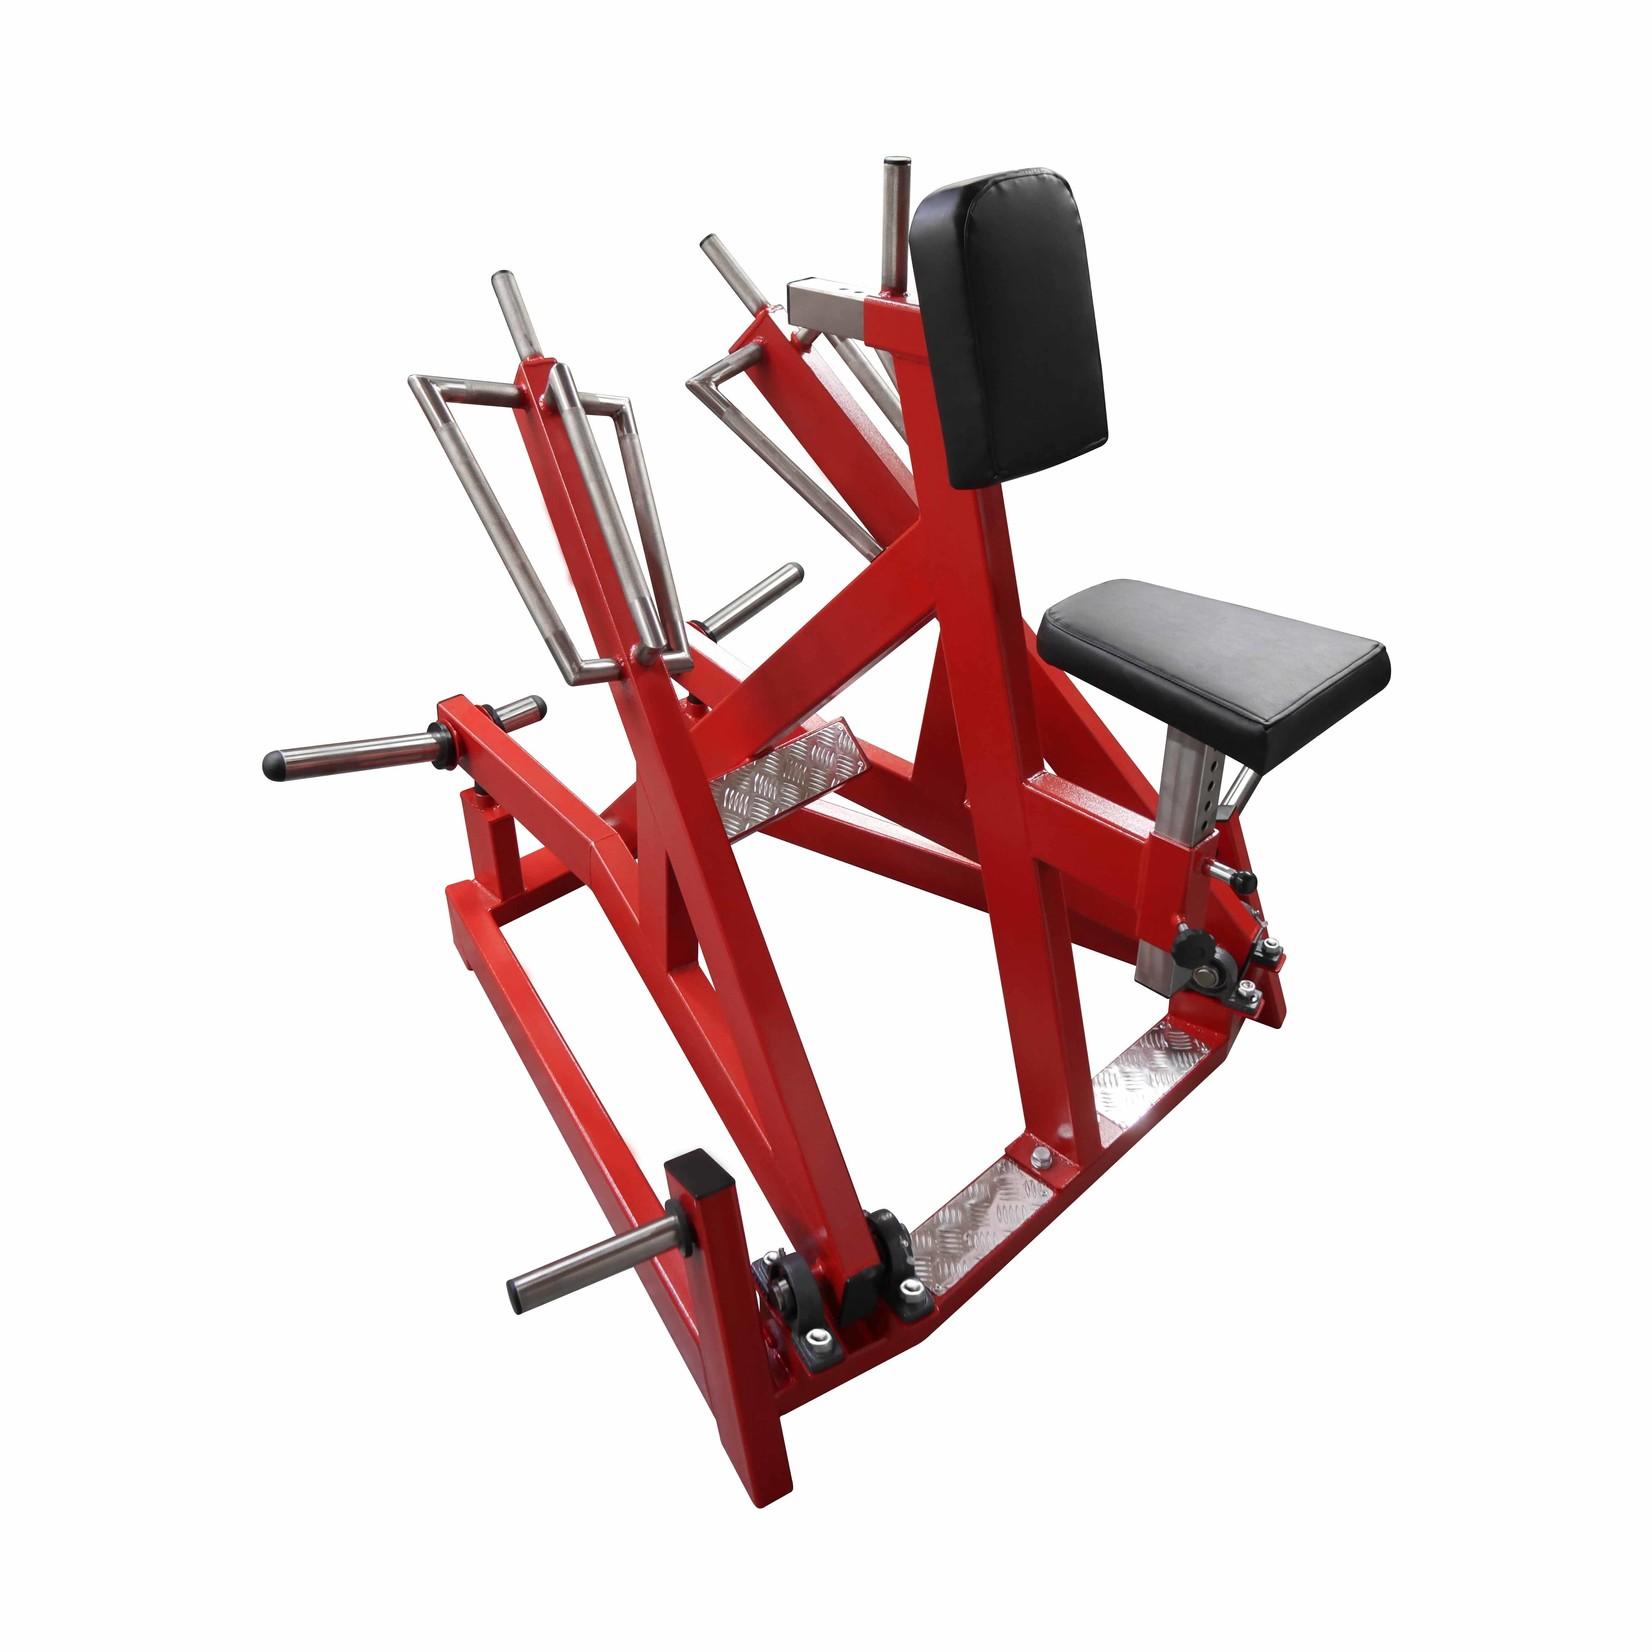 Seated Row Machine 7LX